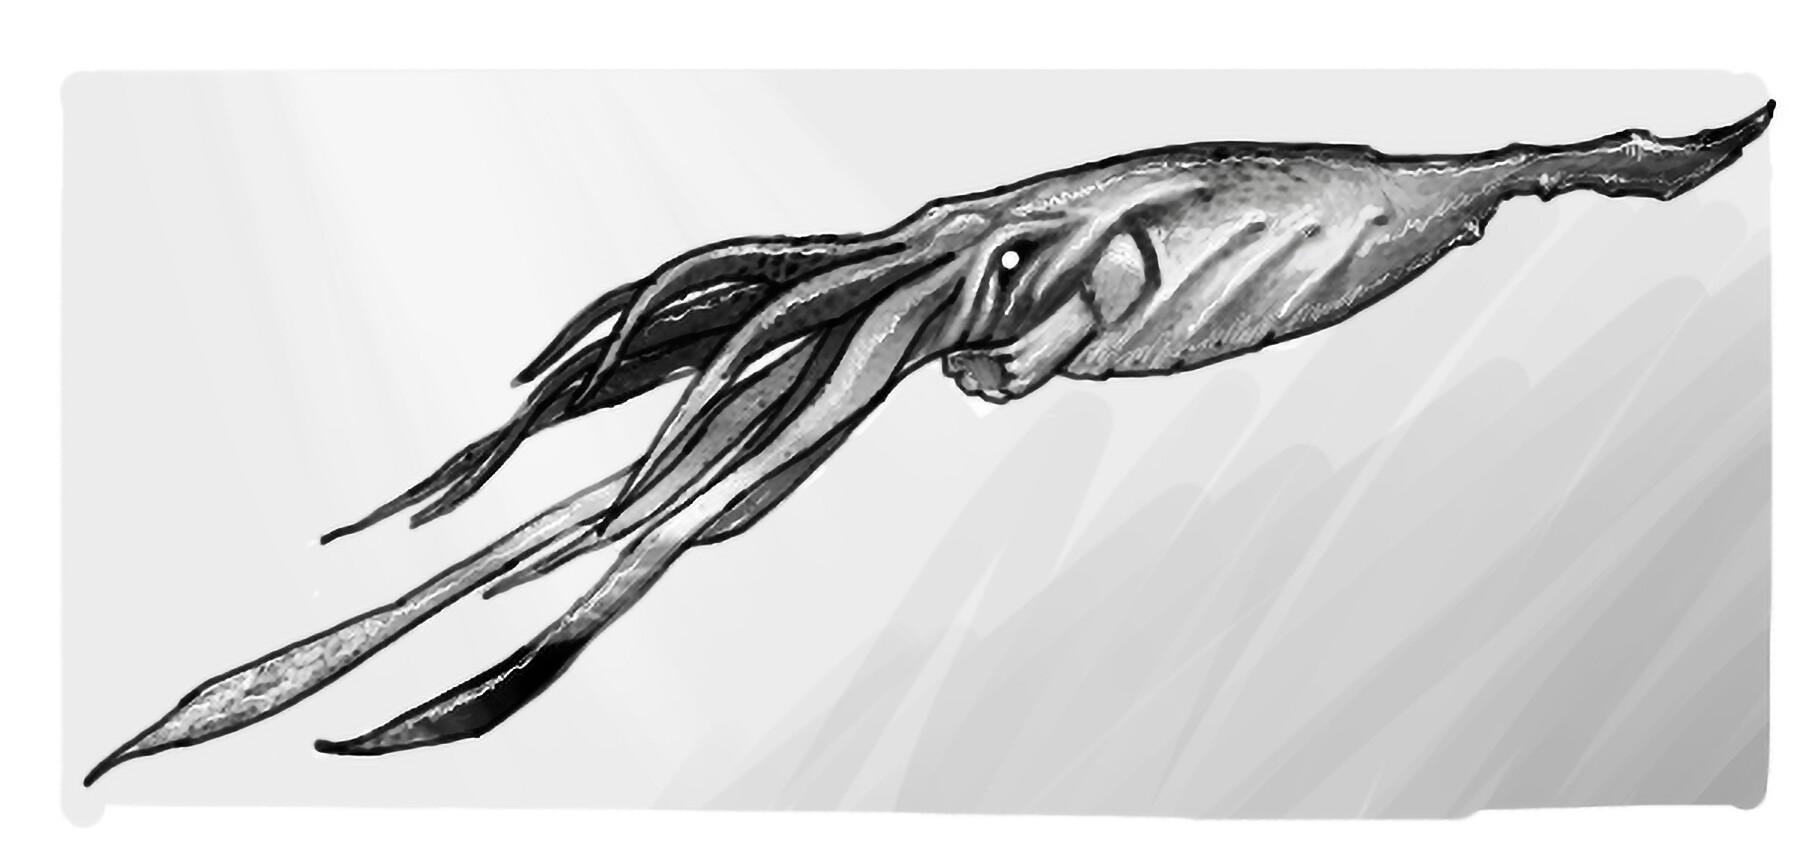 Fatih gurdal squid2